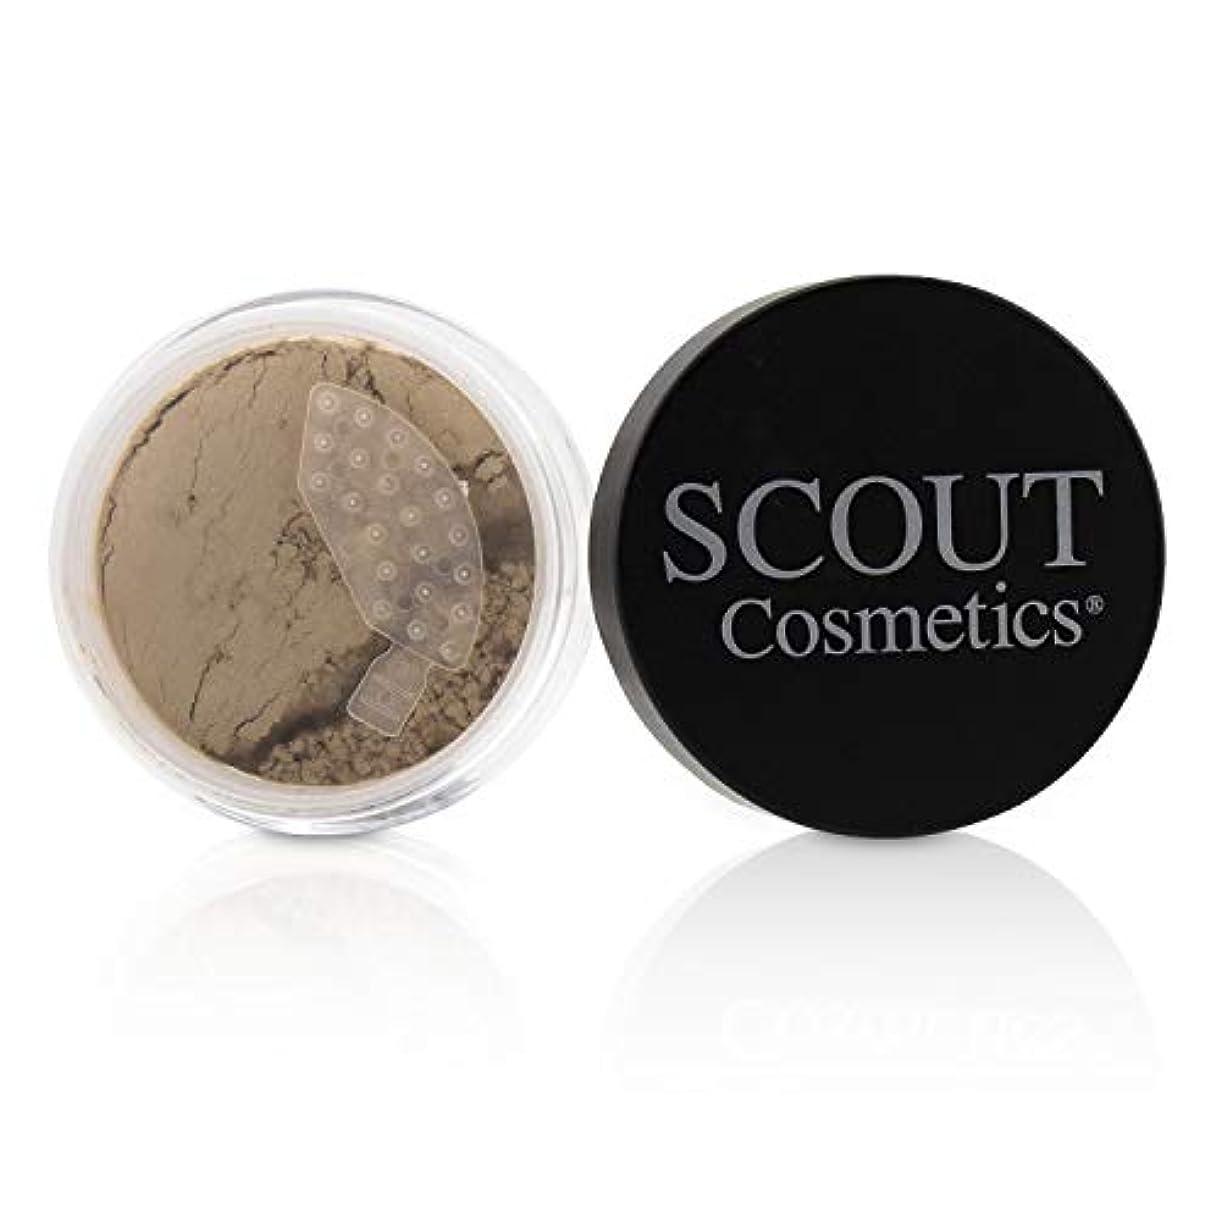 SCOUT Cosmetics Mineral Powder Foundation SPF 20 - # Porcelain 8g/0.28oz並行輸入品